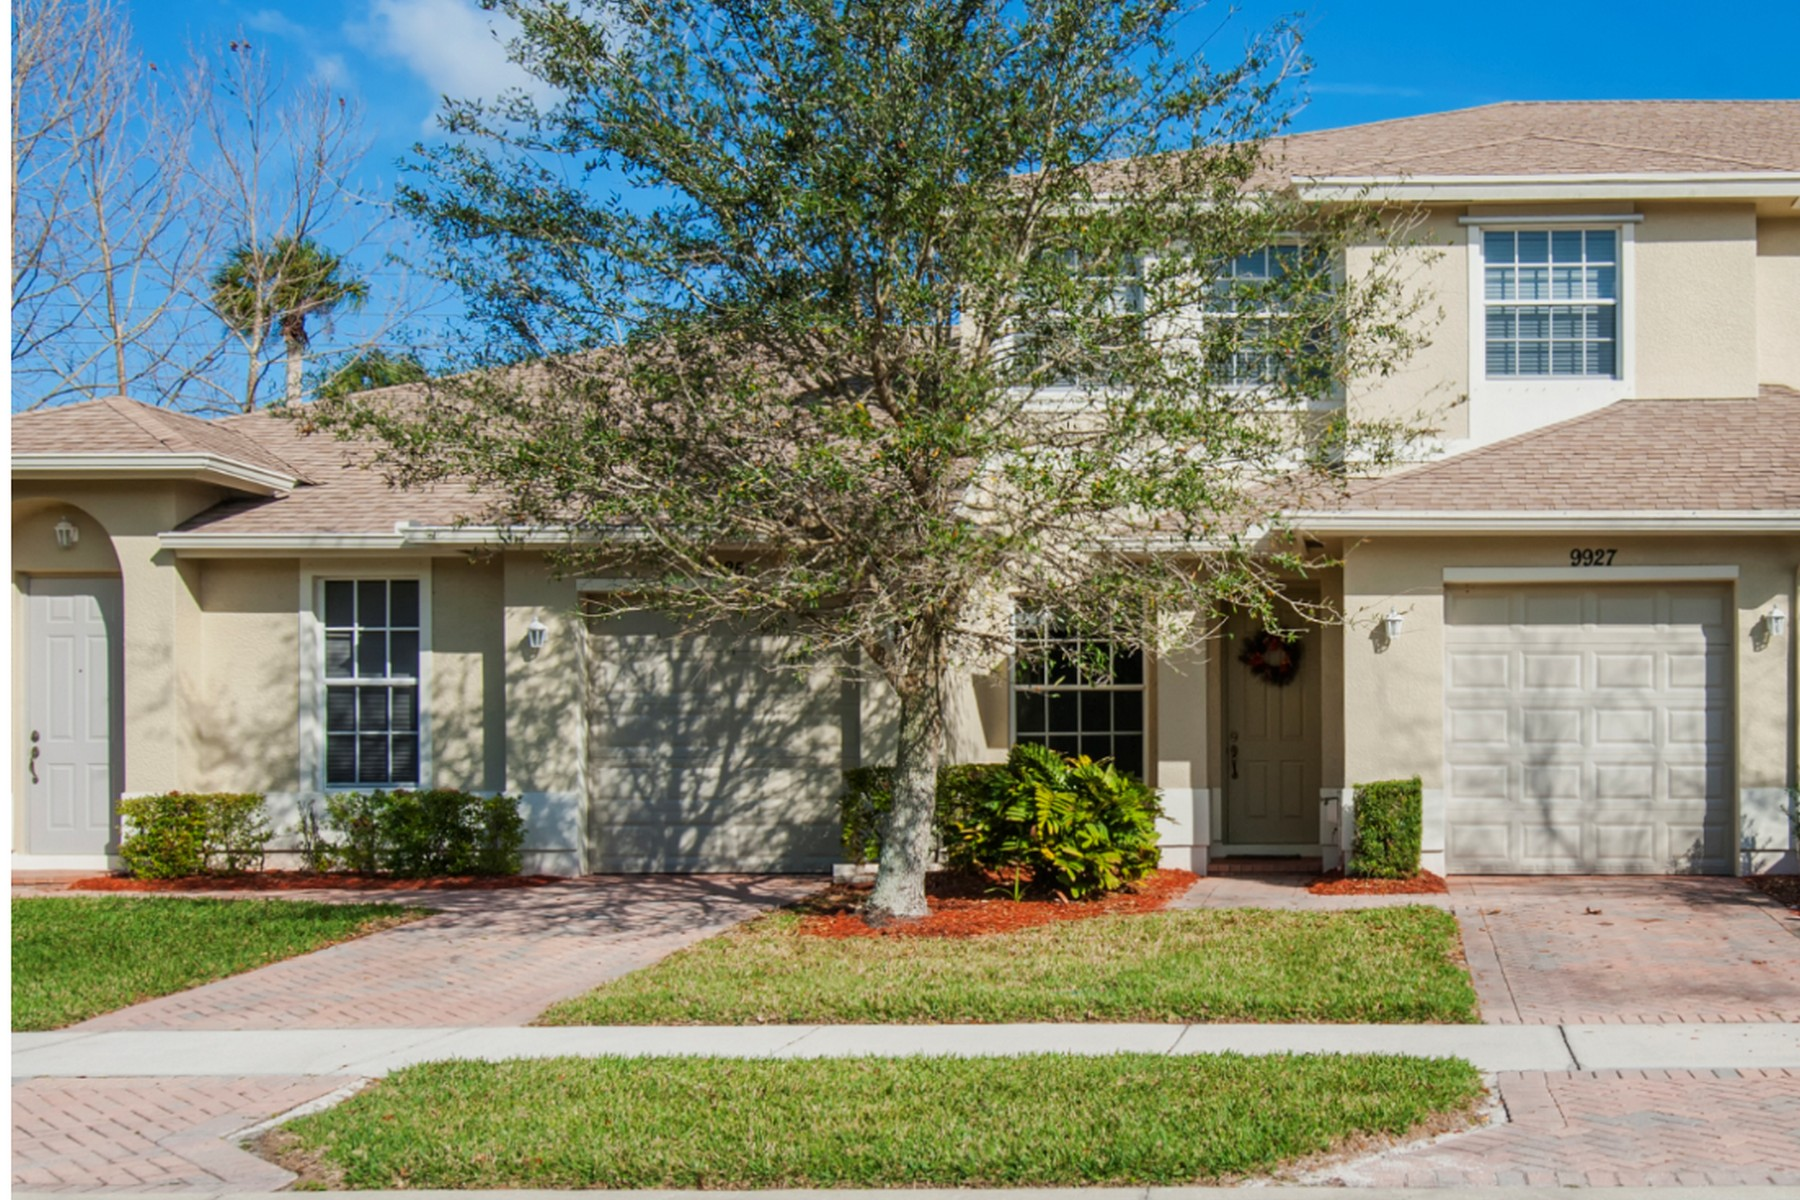 獨棟家庭住宅 為 出售 在 Great Townhome in Verona Trace 9927 E Villa Circle Vero Beach, Florida 32966 United States